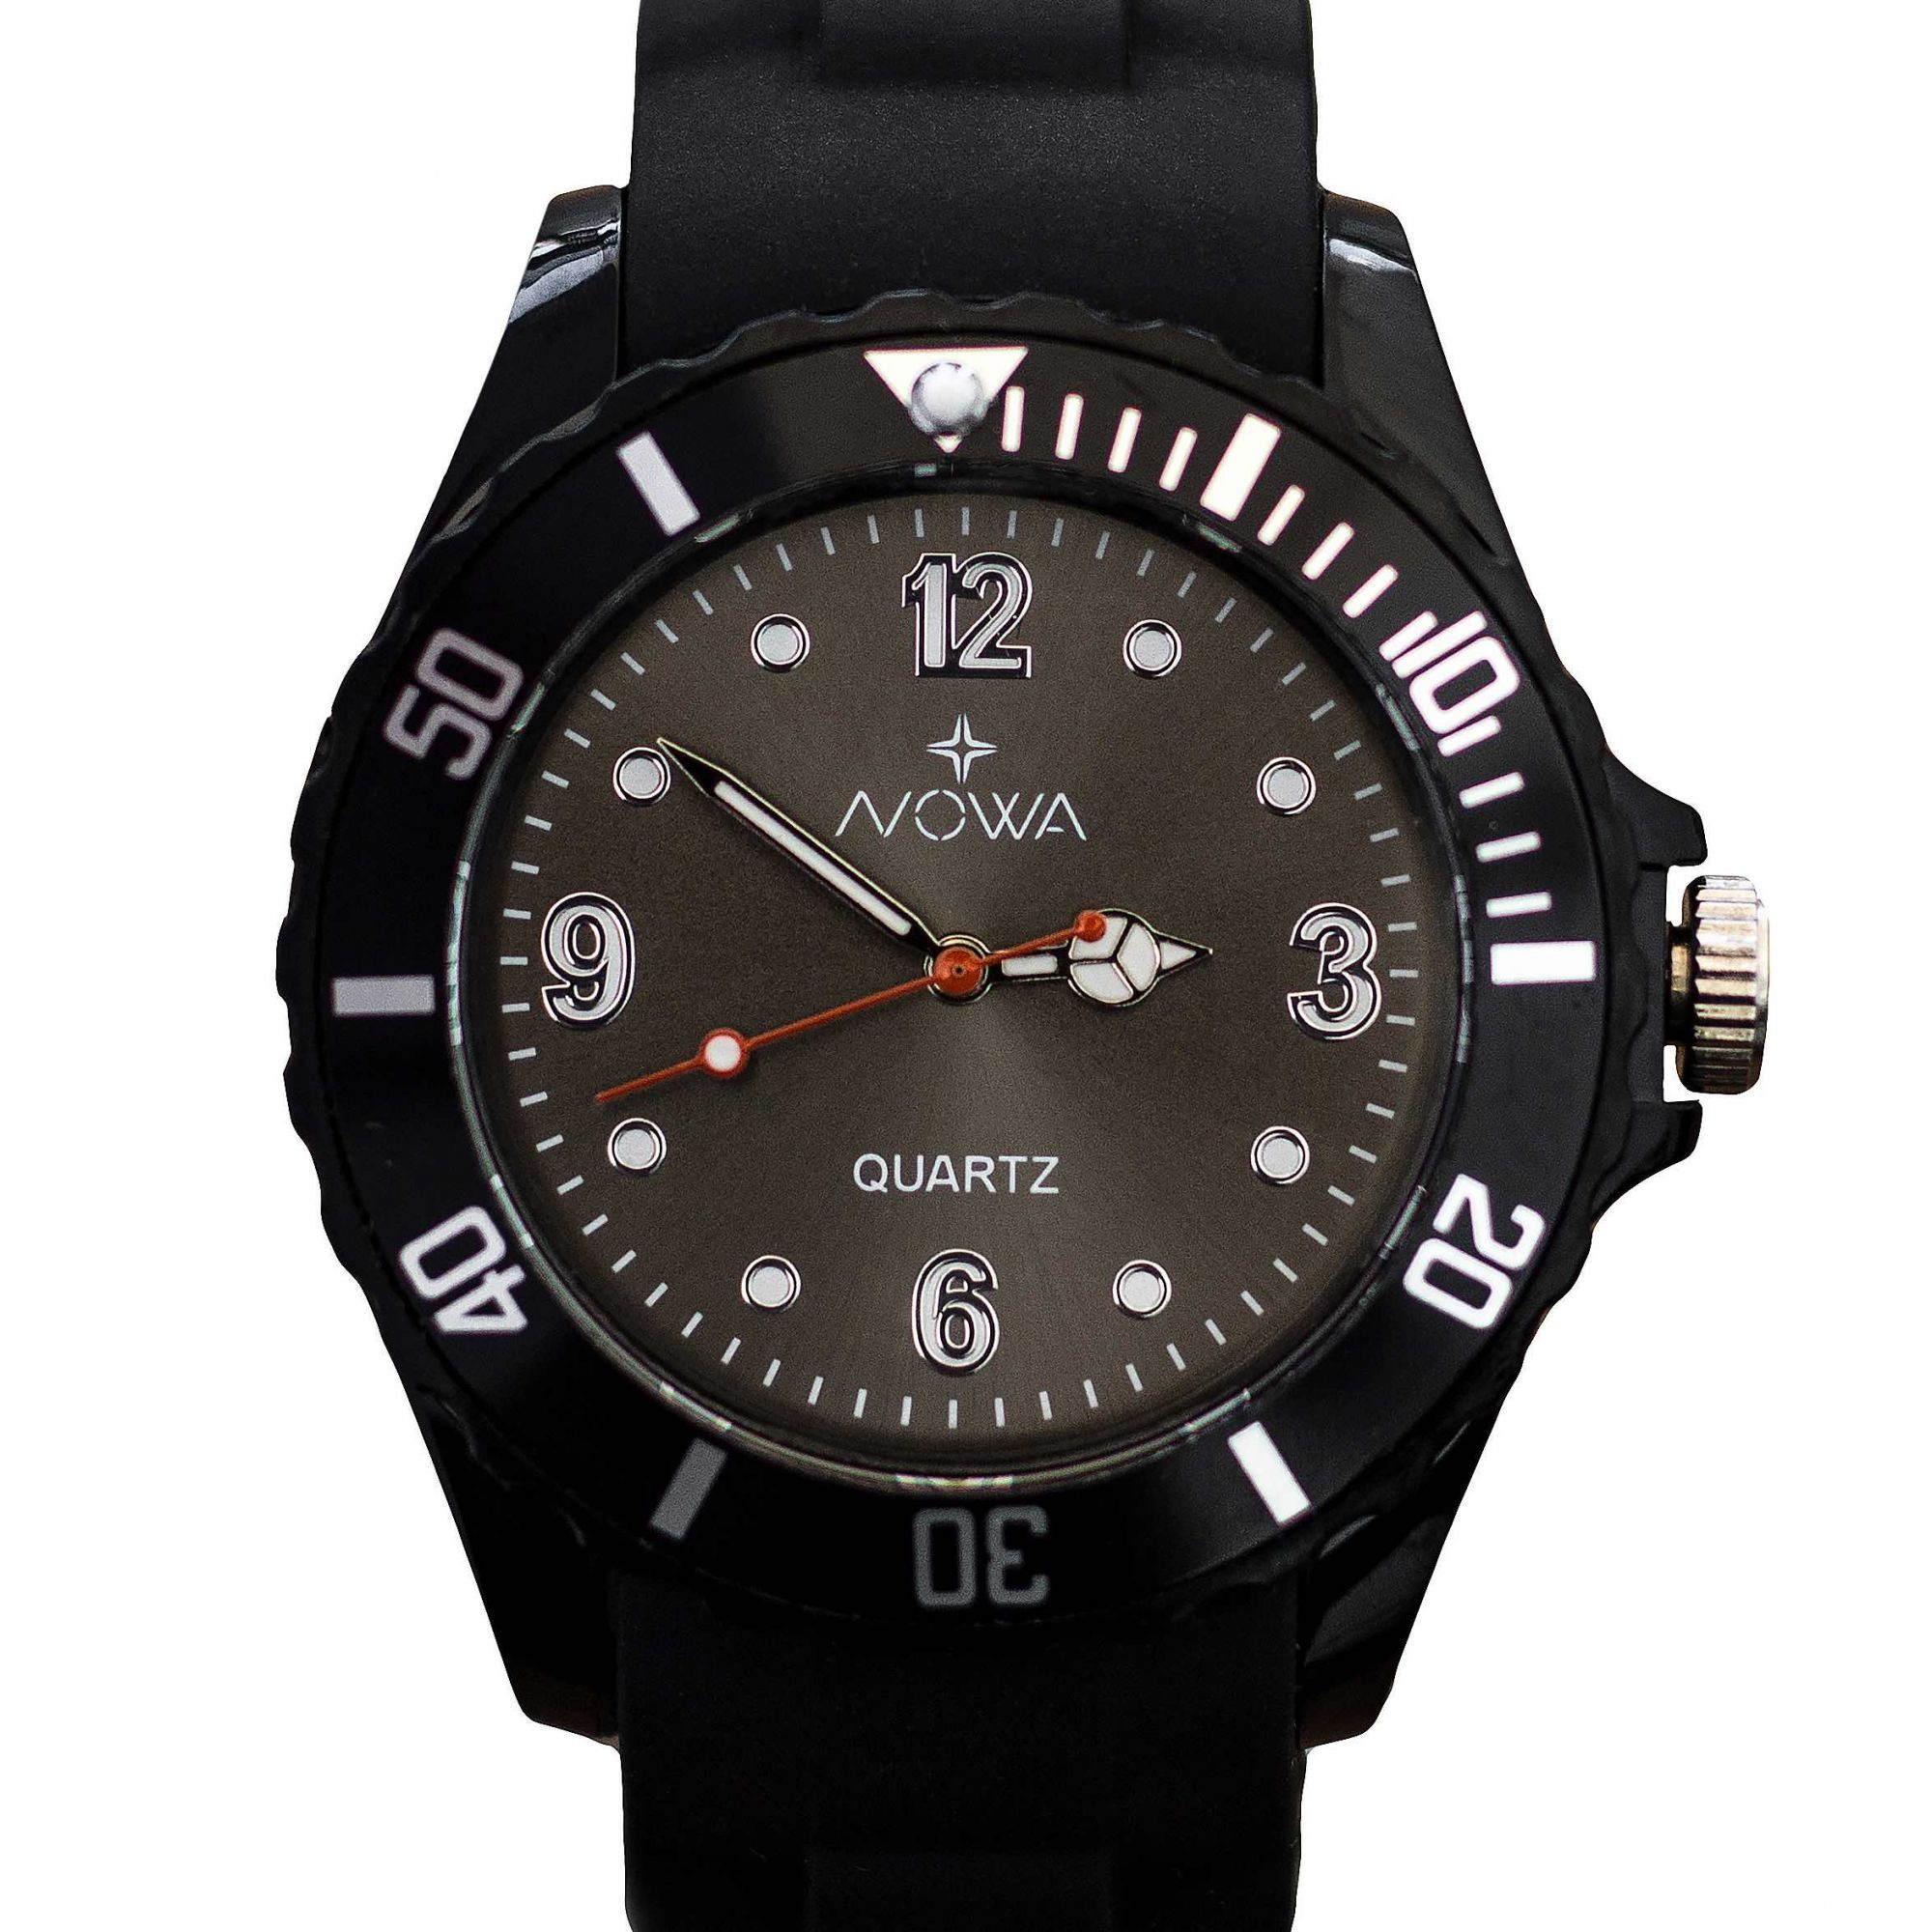 Relógio Nowa Masculino Preto NW0521PK Borracha